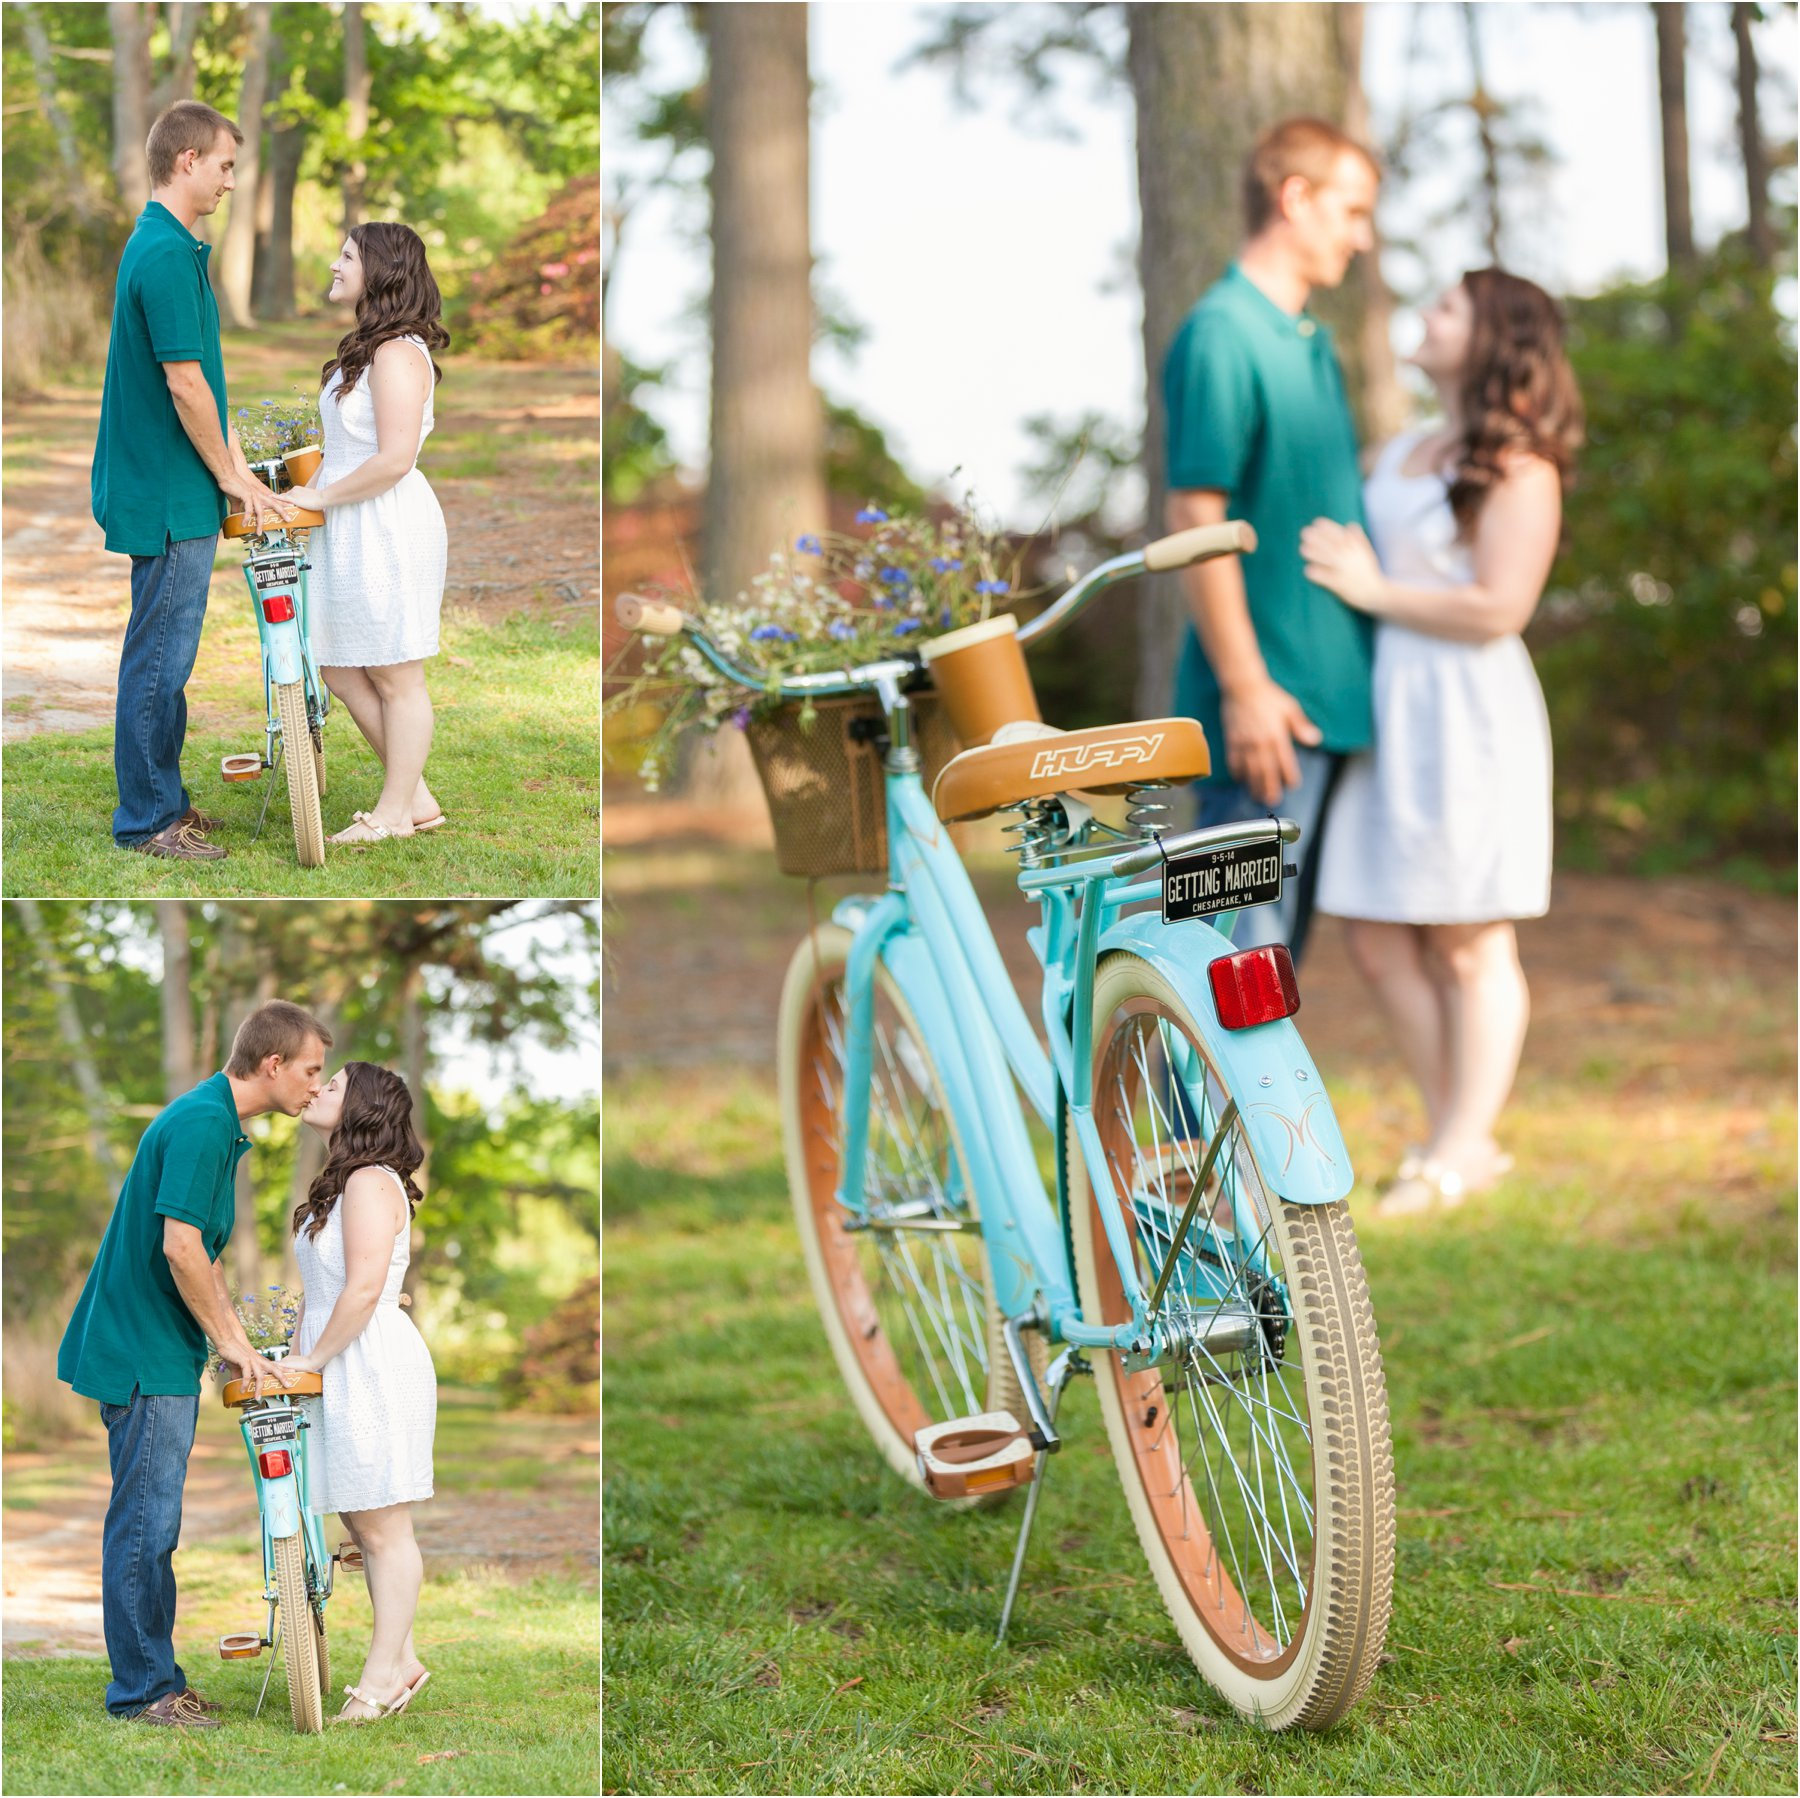 engagement_Photography_bike_ride_engagements_Jessica_Ryan_Photography_virginia_virginia_beach_0314